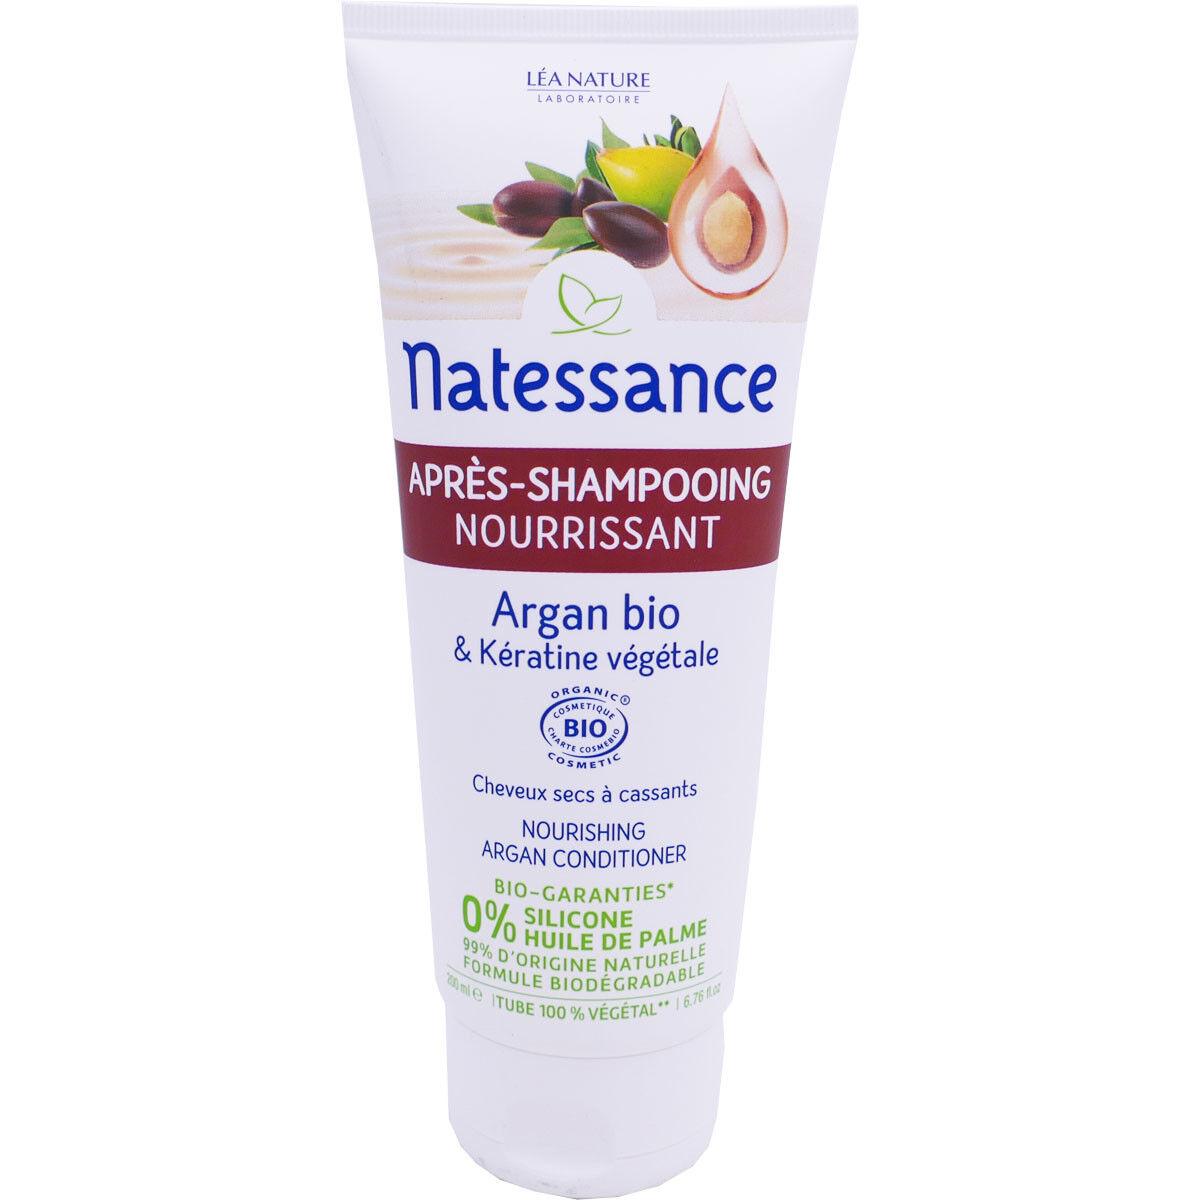 Natessance apres shampooing aragan bio 200ml